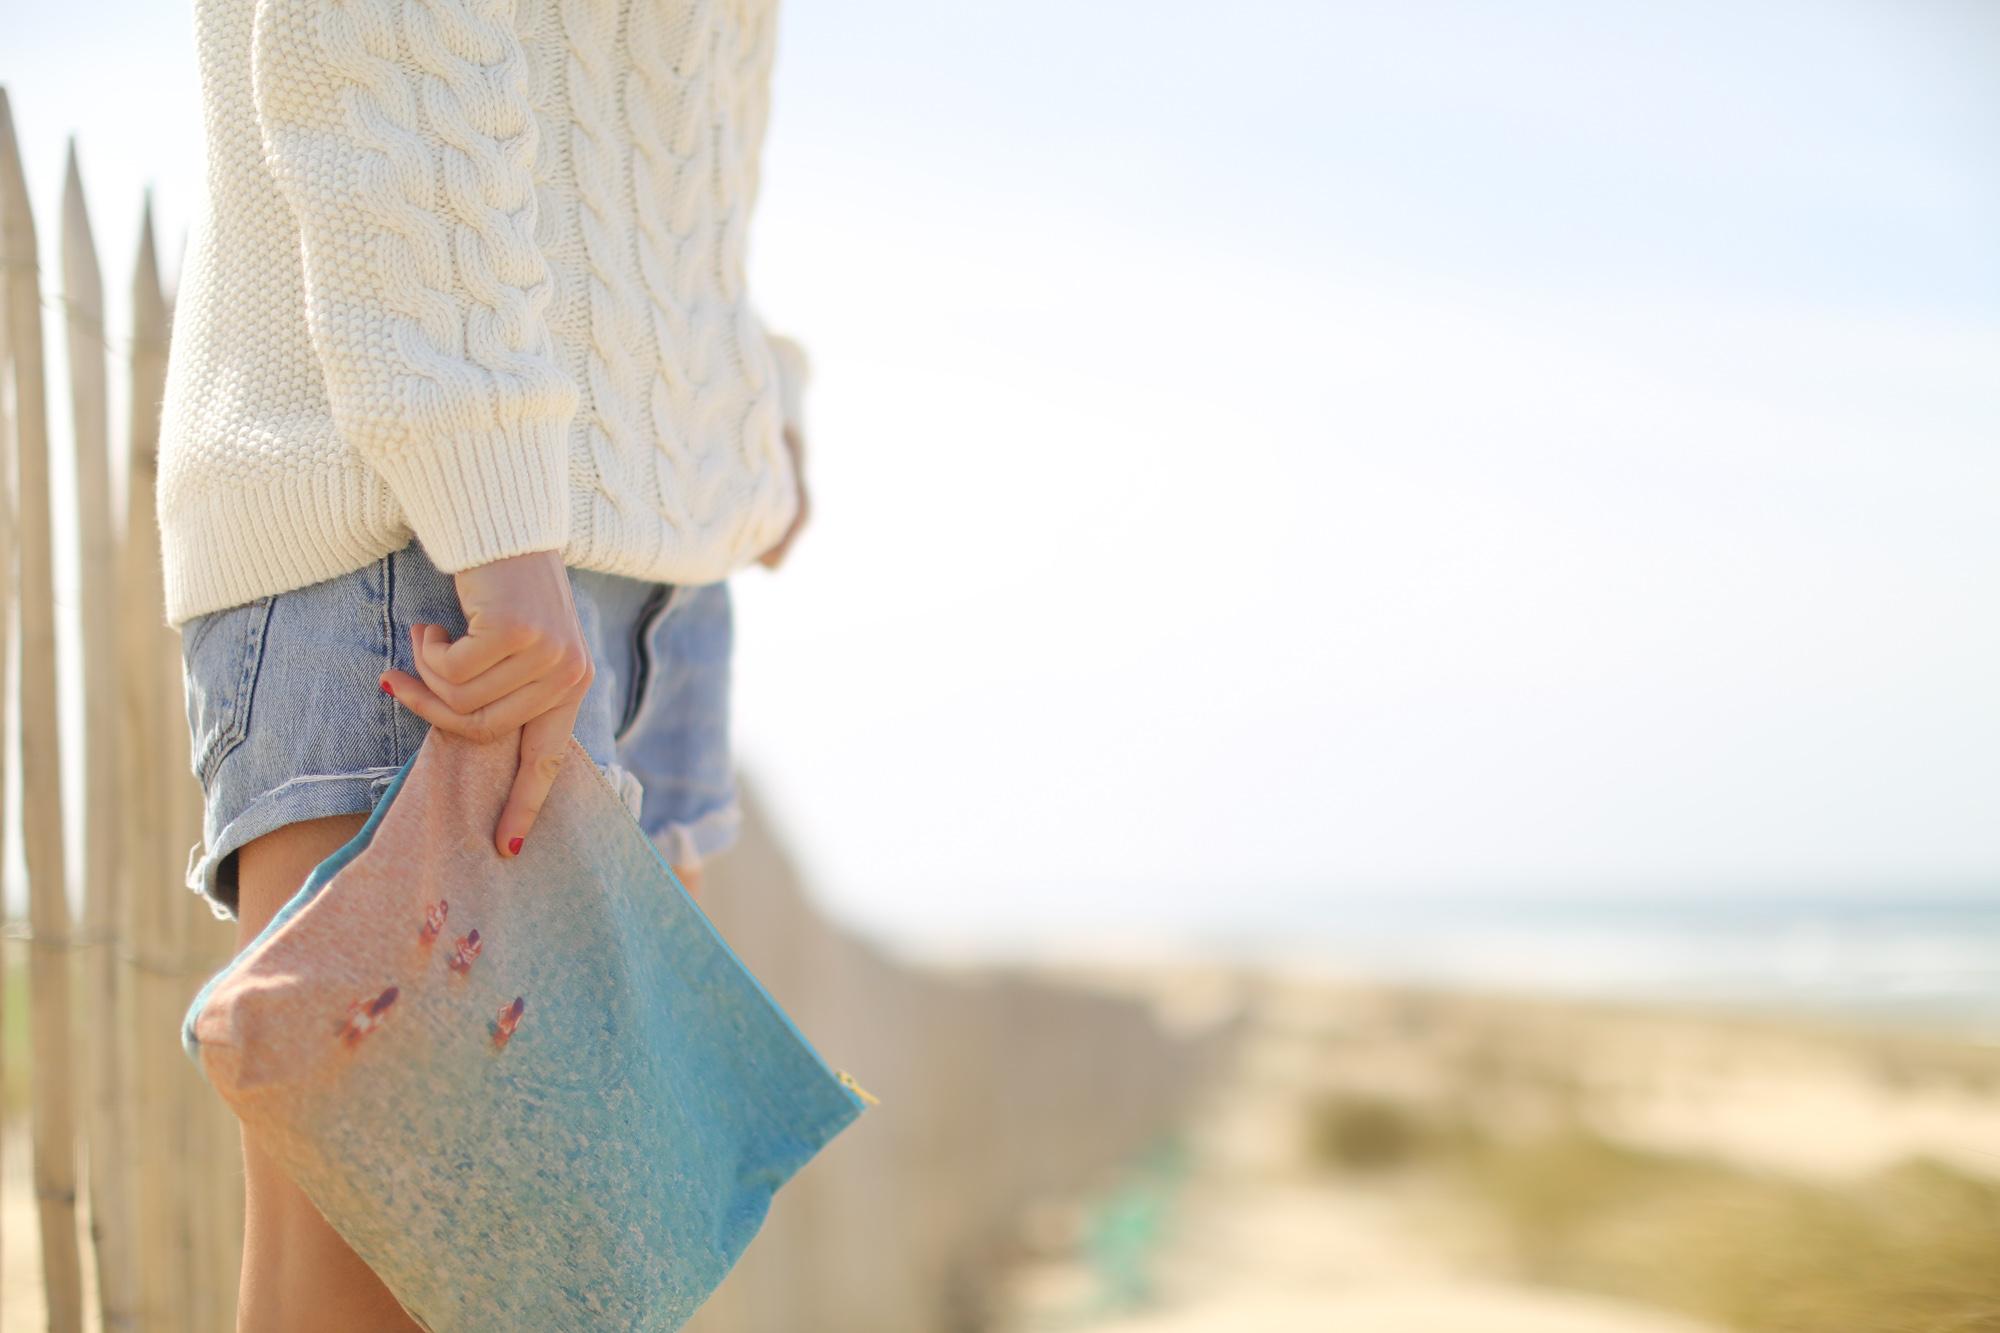 Clochet-streetstyle-levis-501-vintage-shorts-superga-crochet-thalatta-concept-bathers-pouch-5